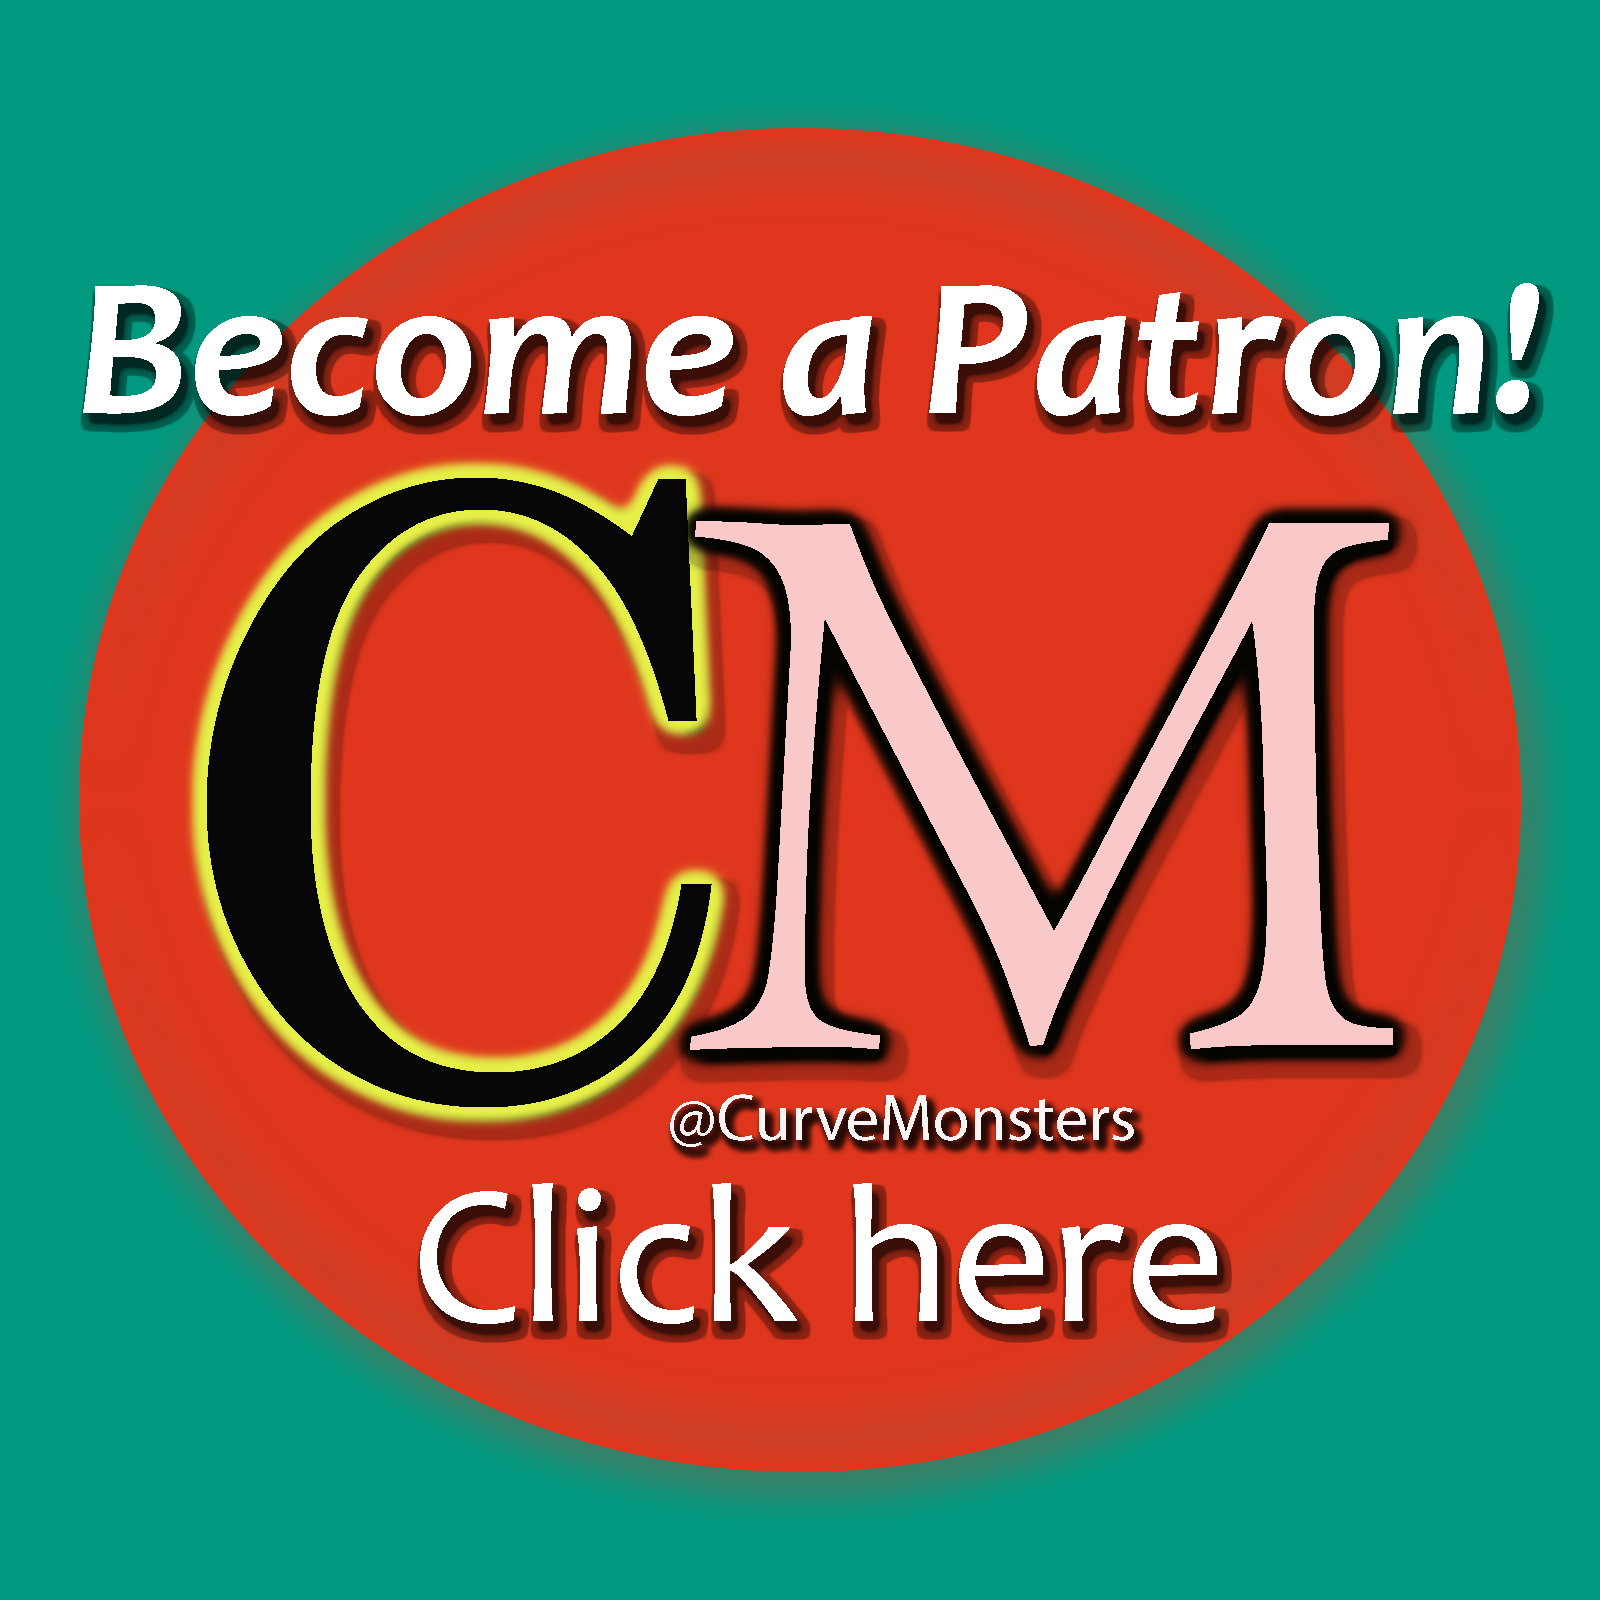 CurveMonsters_Patron